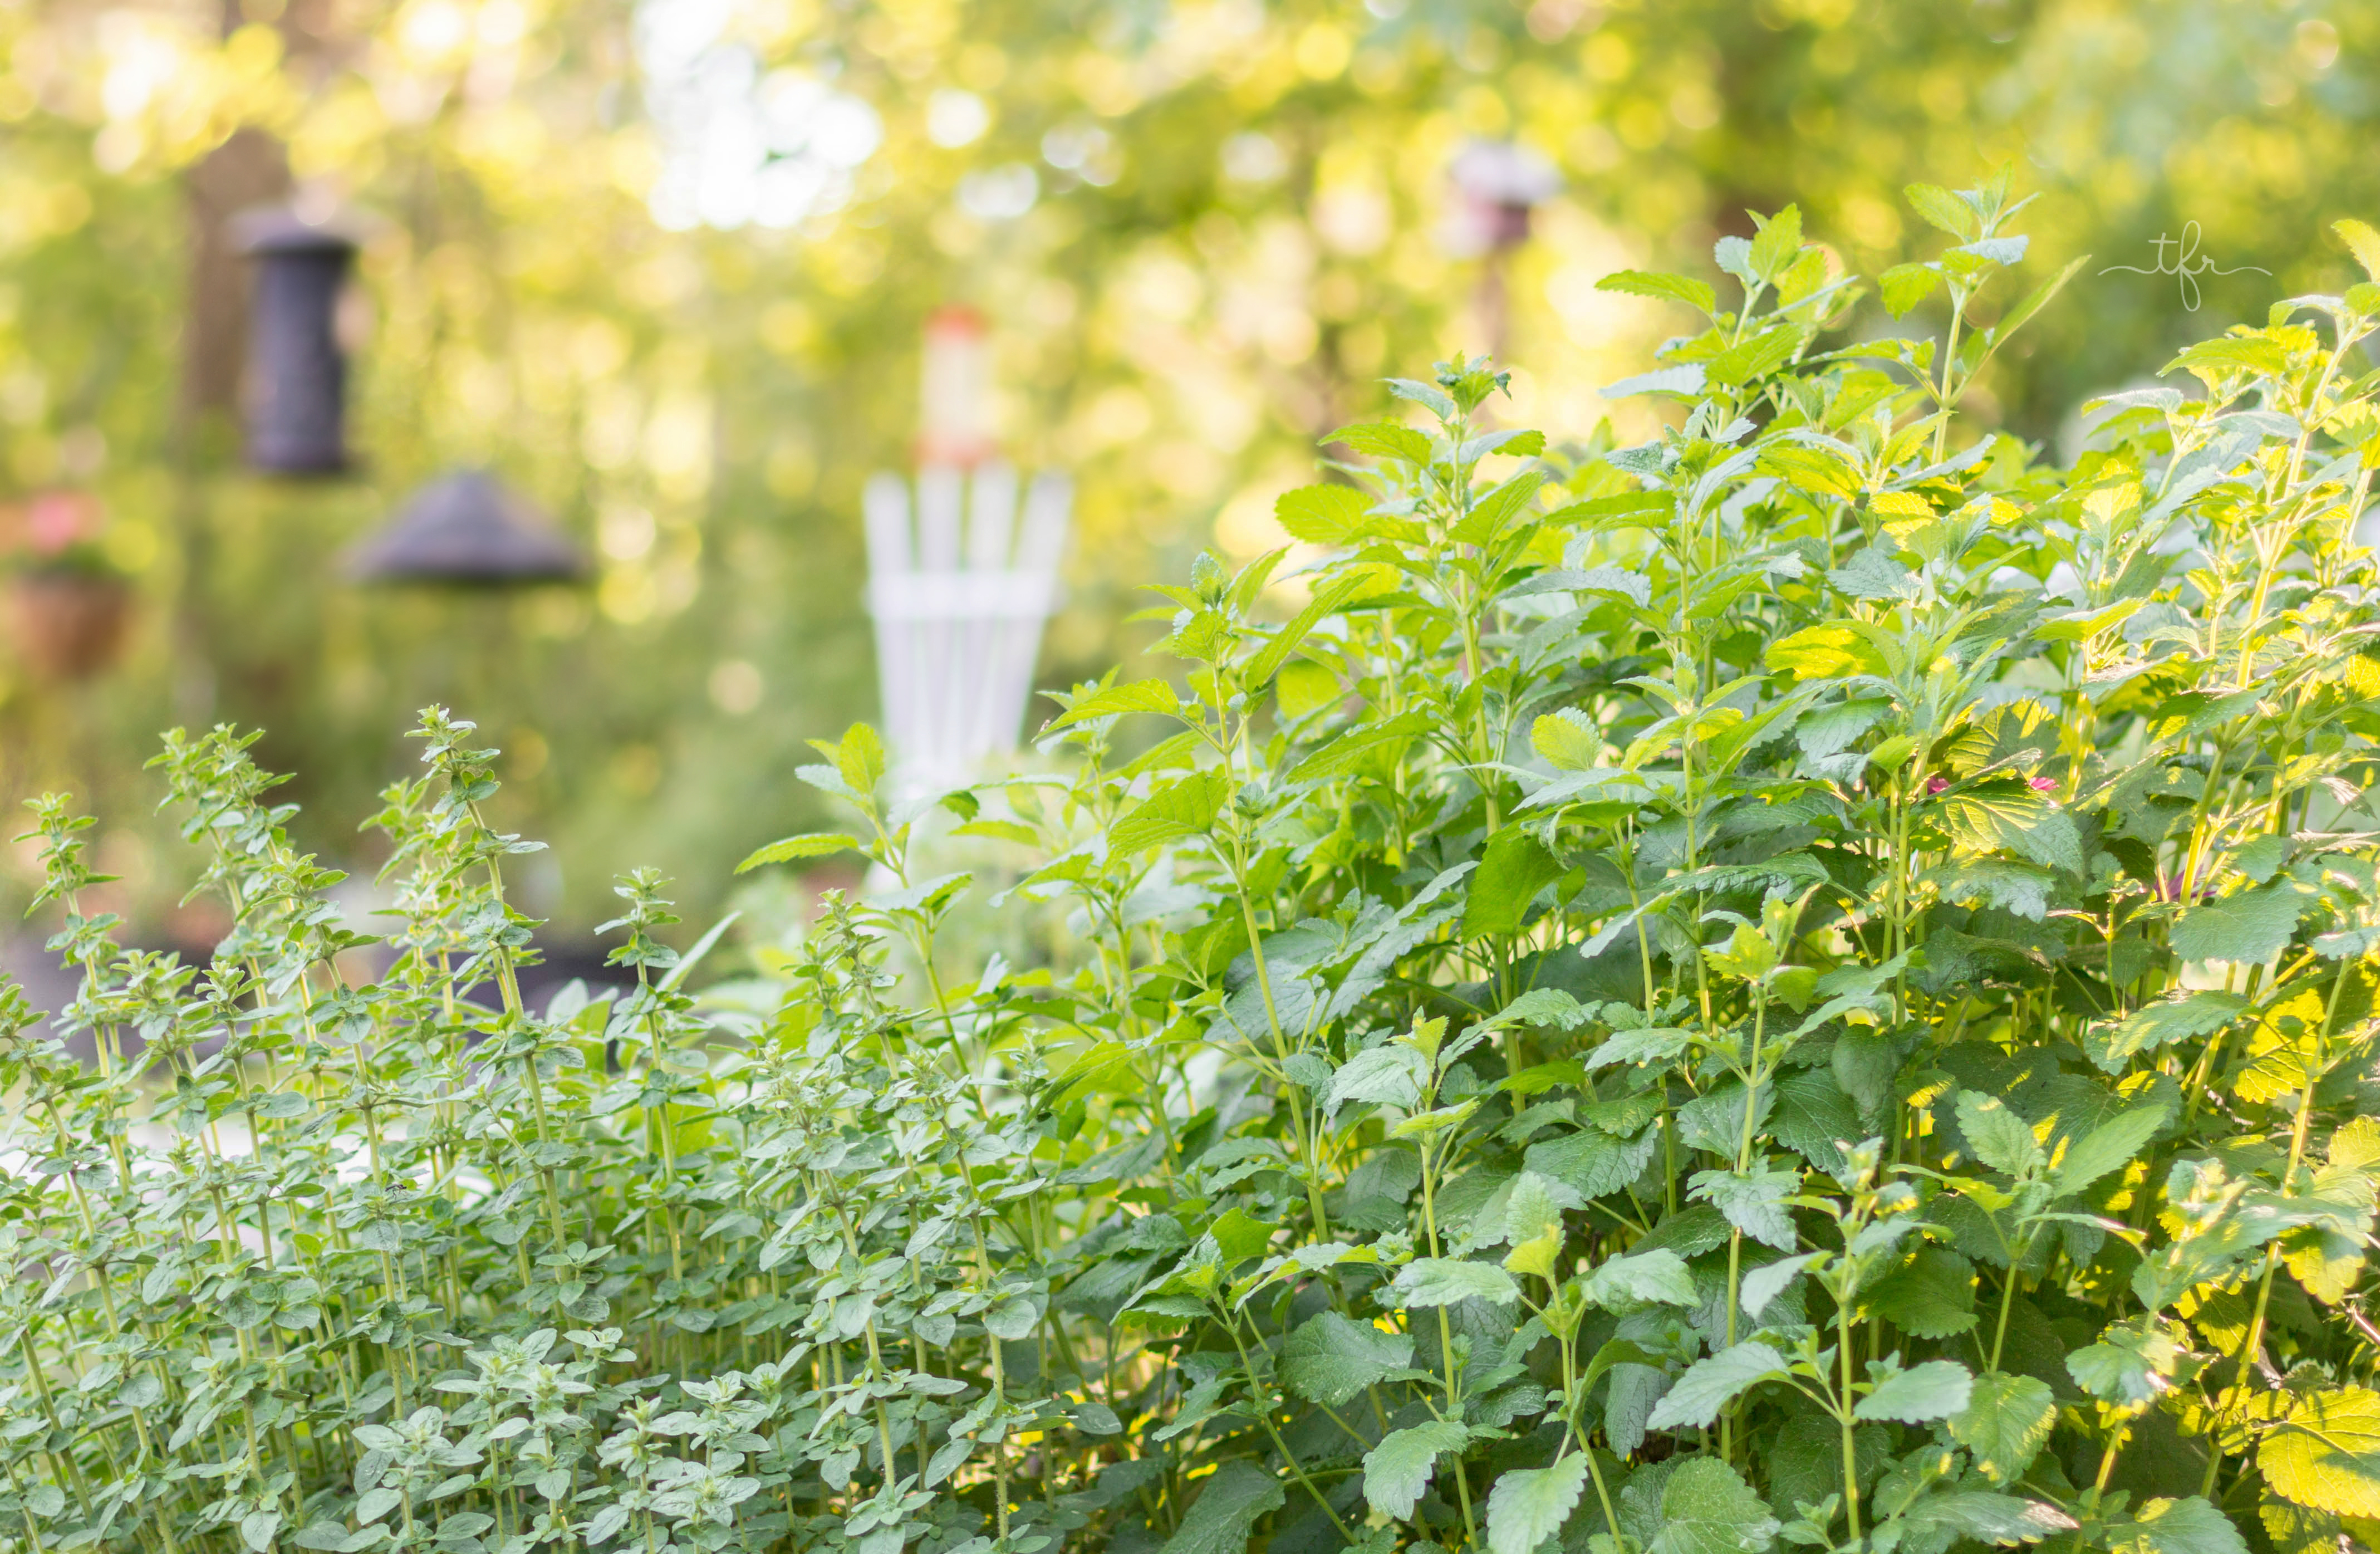 Calming & Stress Reducing Lemon Balm & Lavender Iced Tea | Lemon balm on the right, growing in the herb garden.